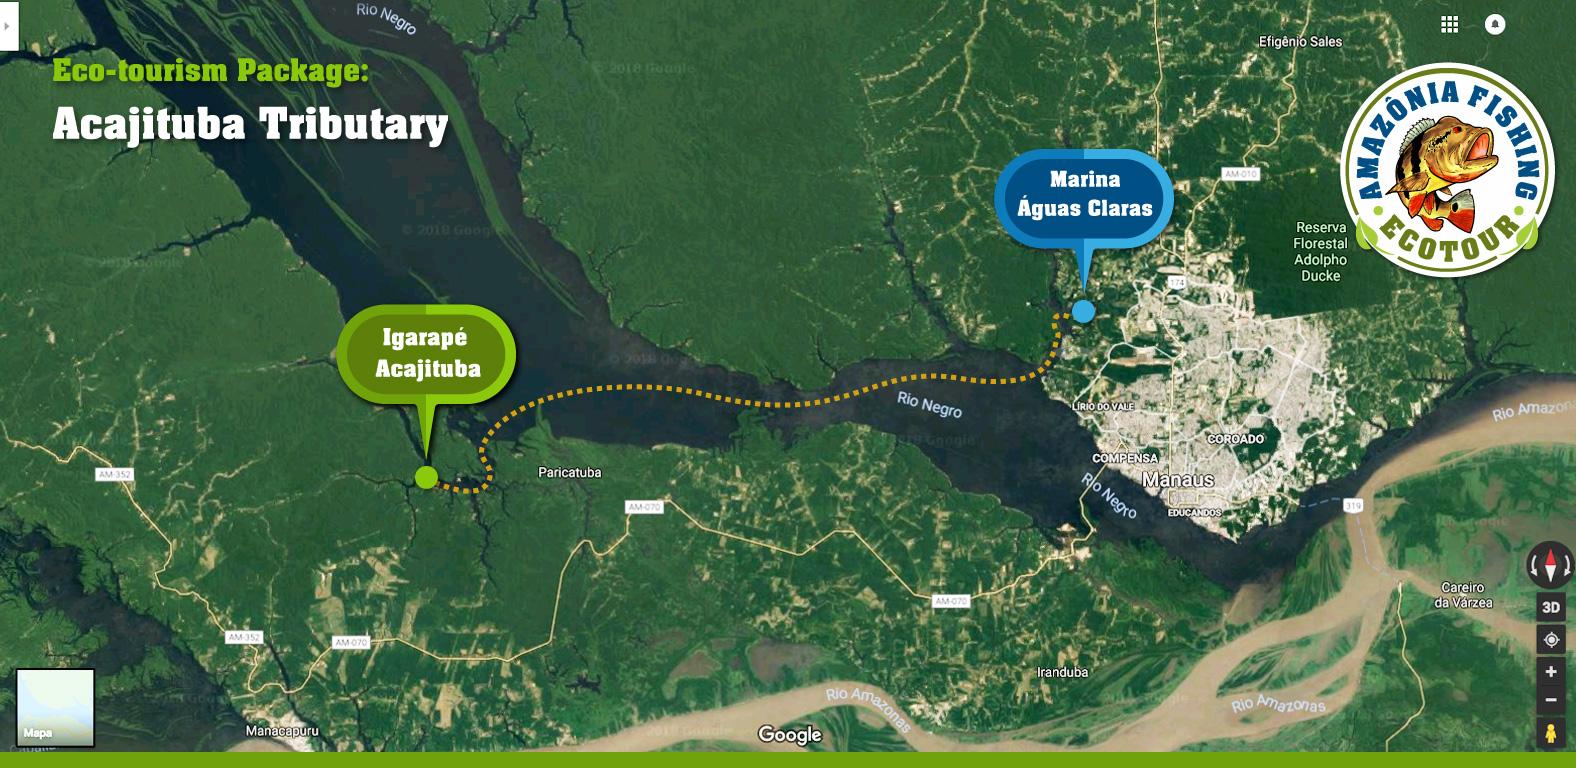 Eco-tourism Package - Acajituba Tributary